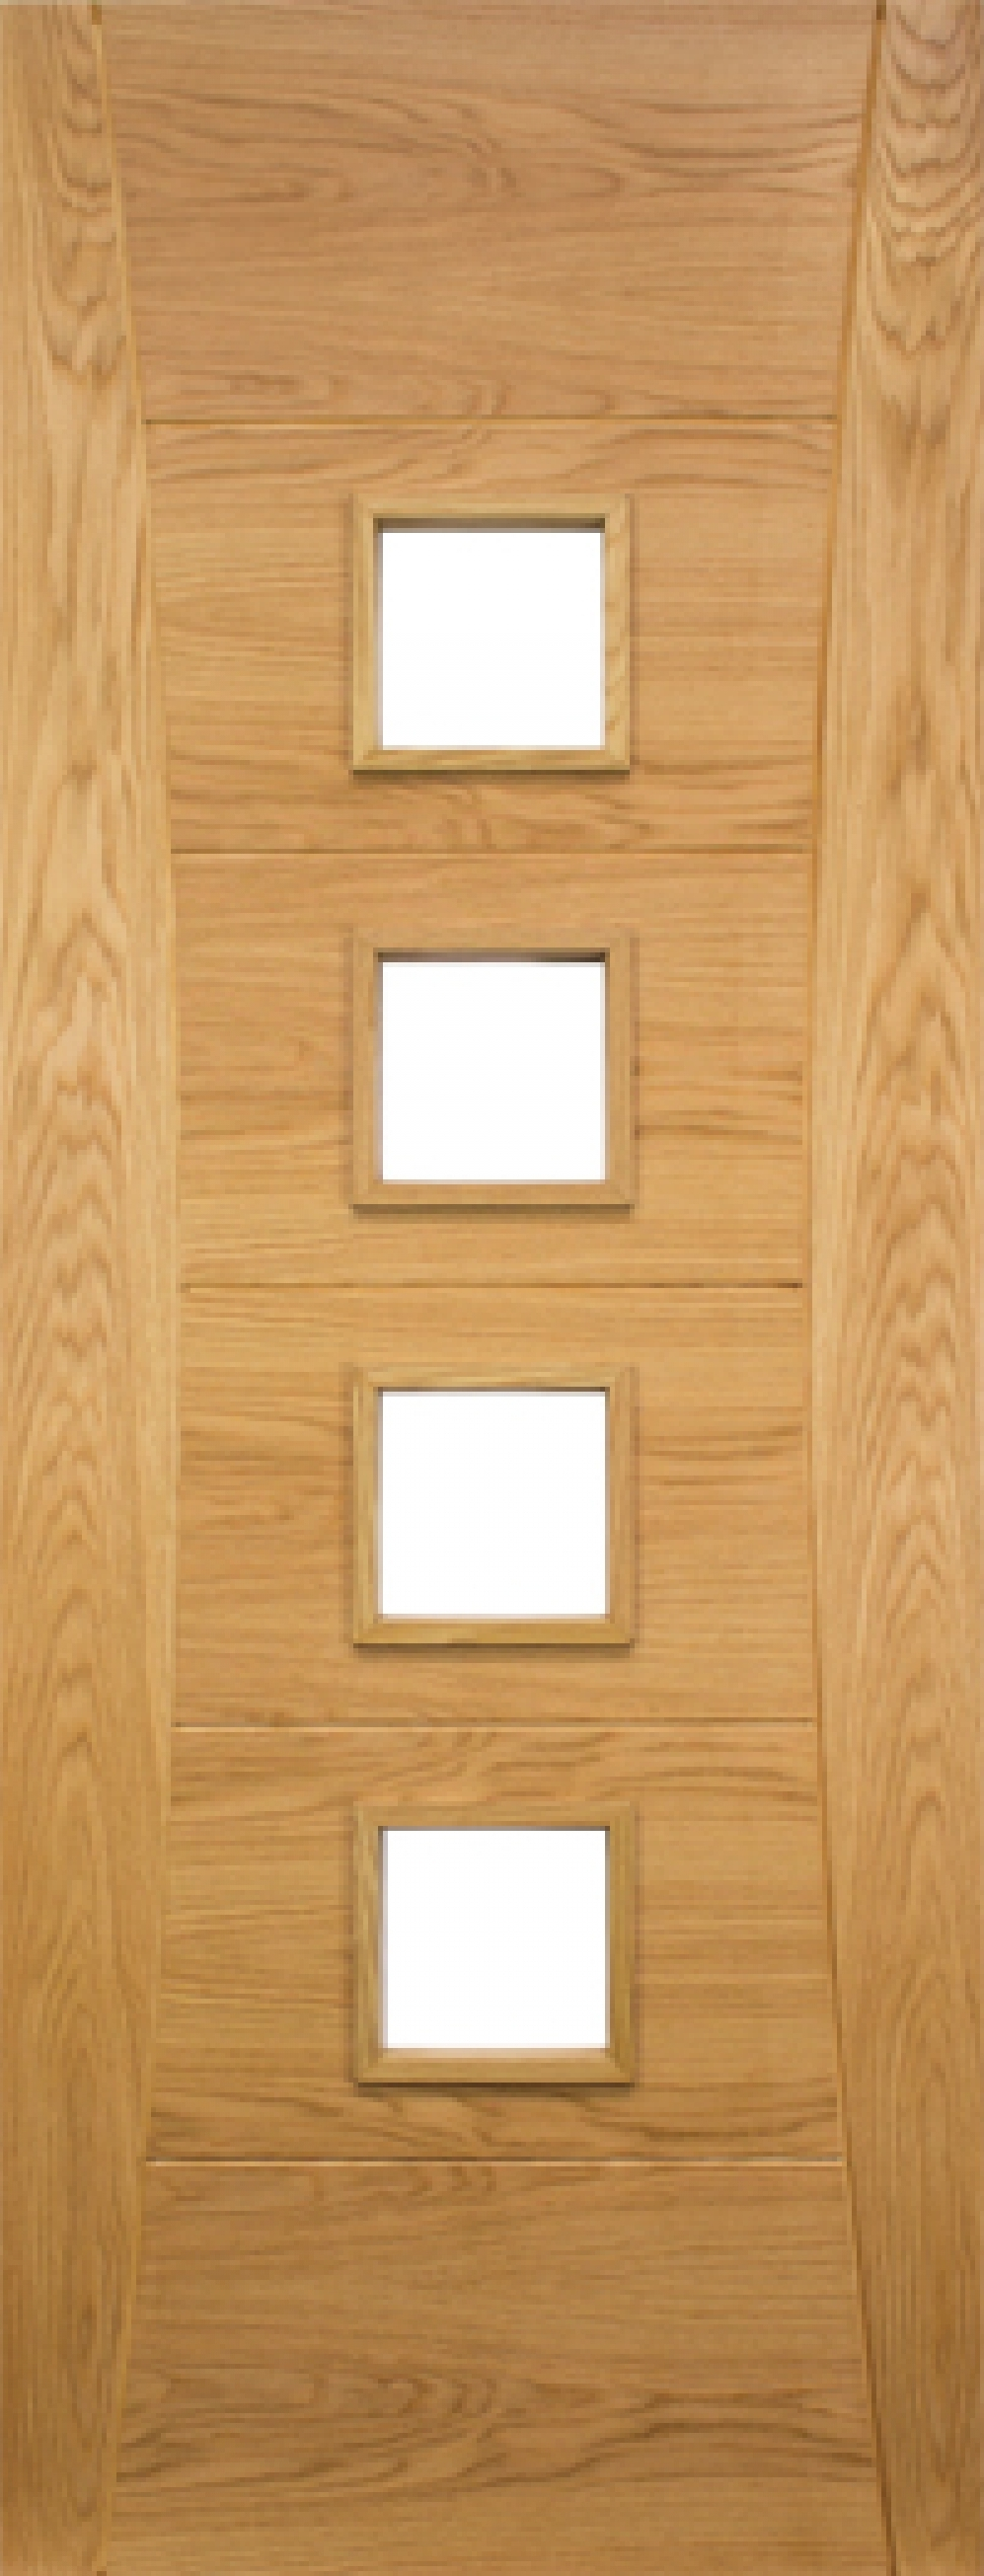 Pamplona Glazed Oak Door - Prefinished